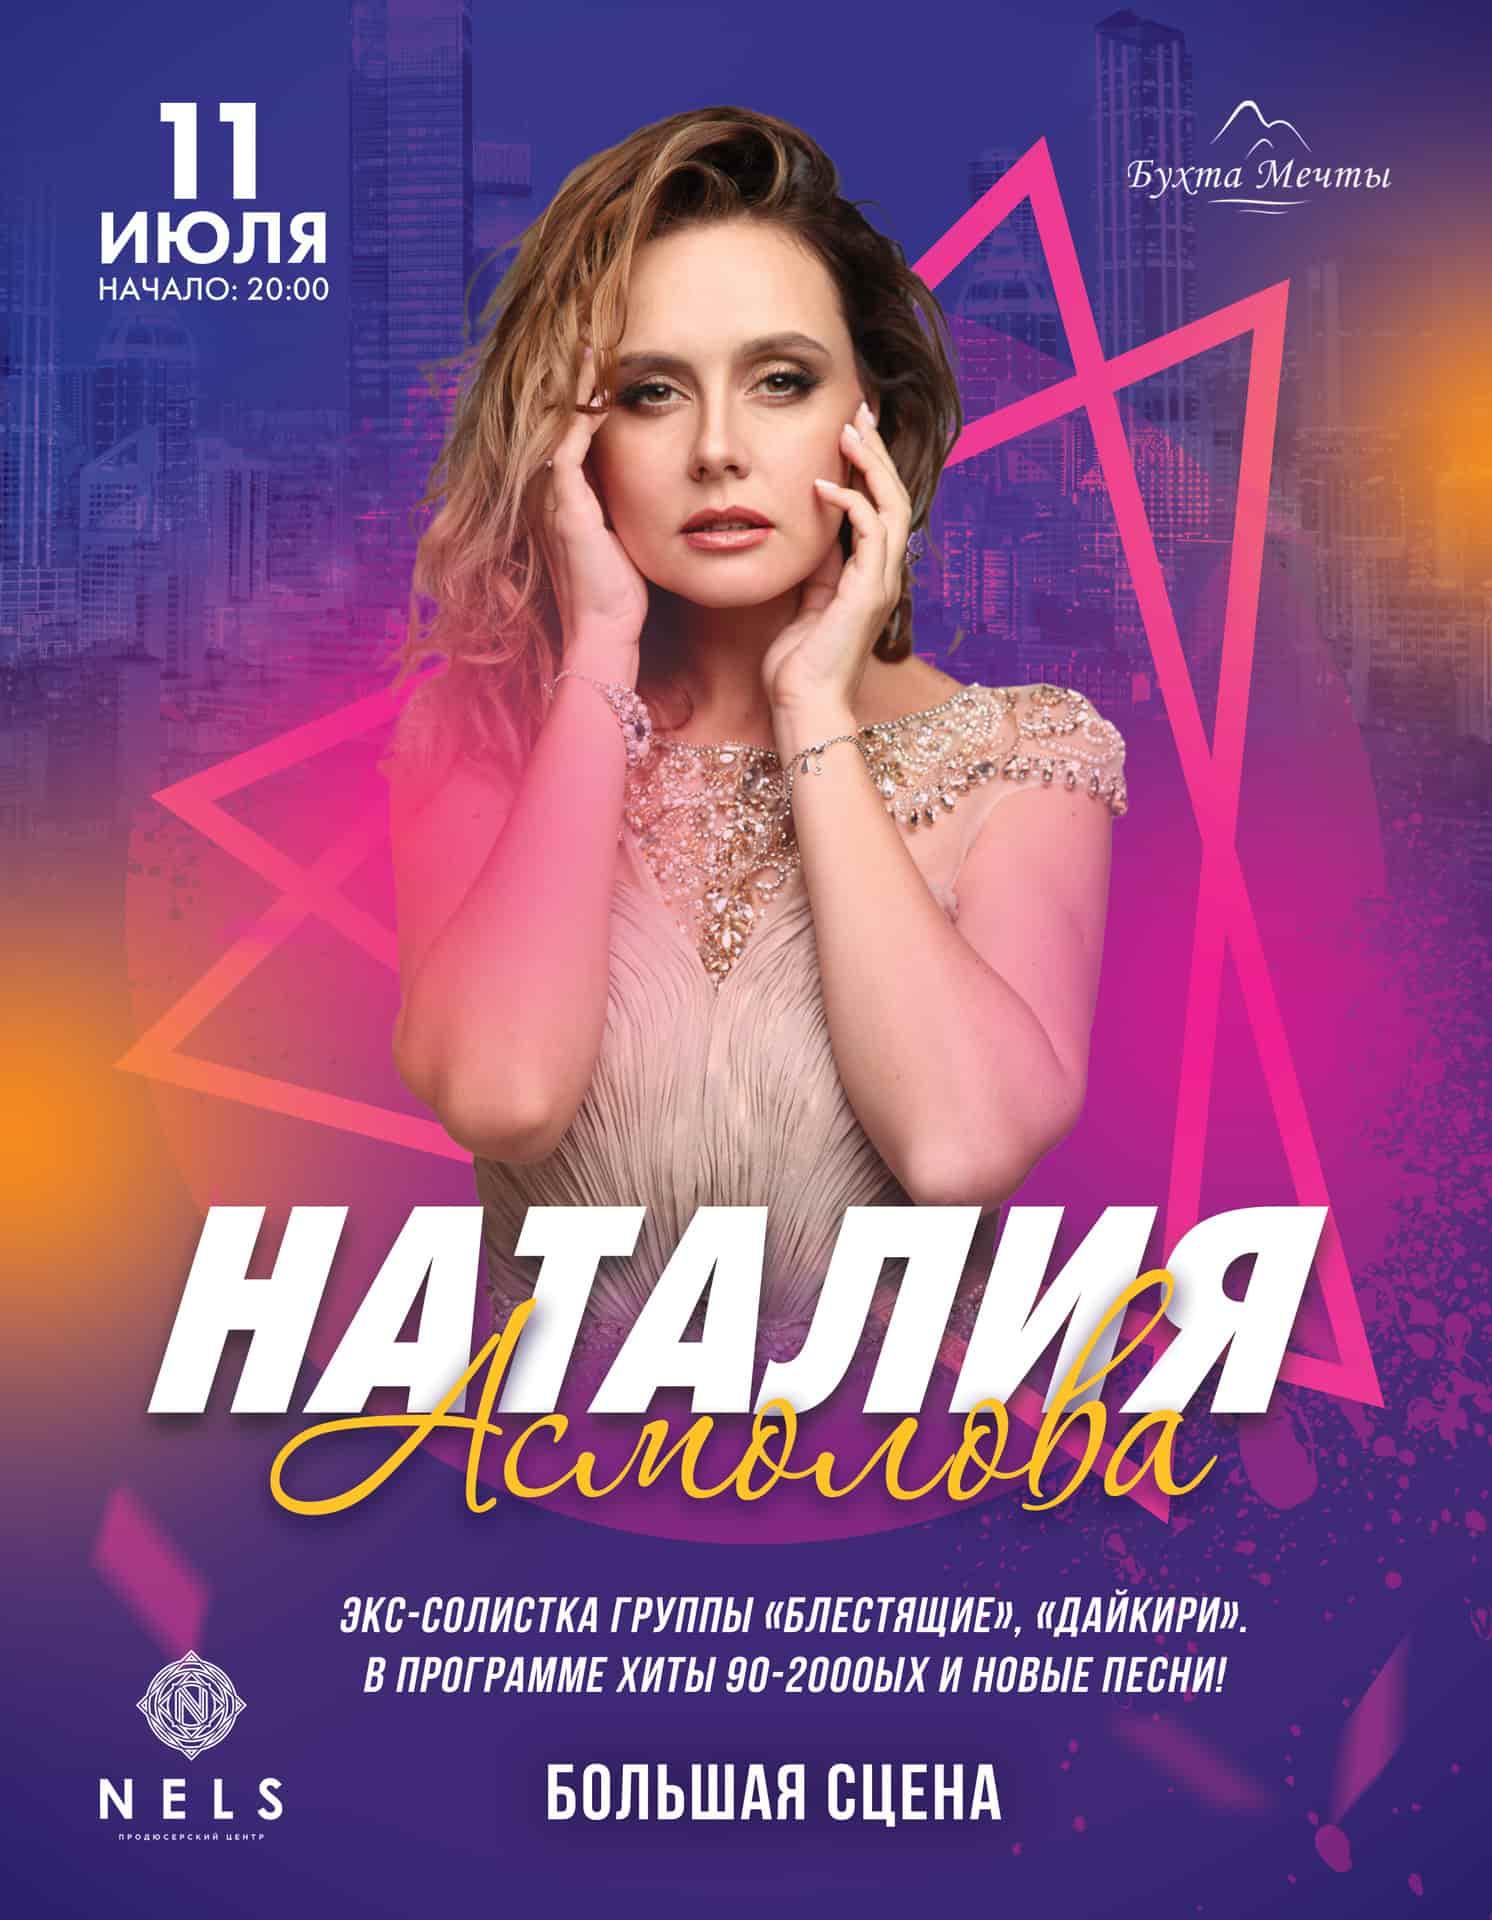 Наталия Асмолова в Бухте Мечты